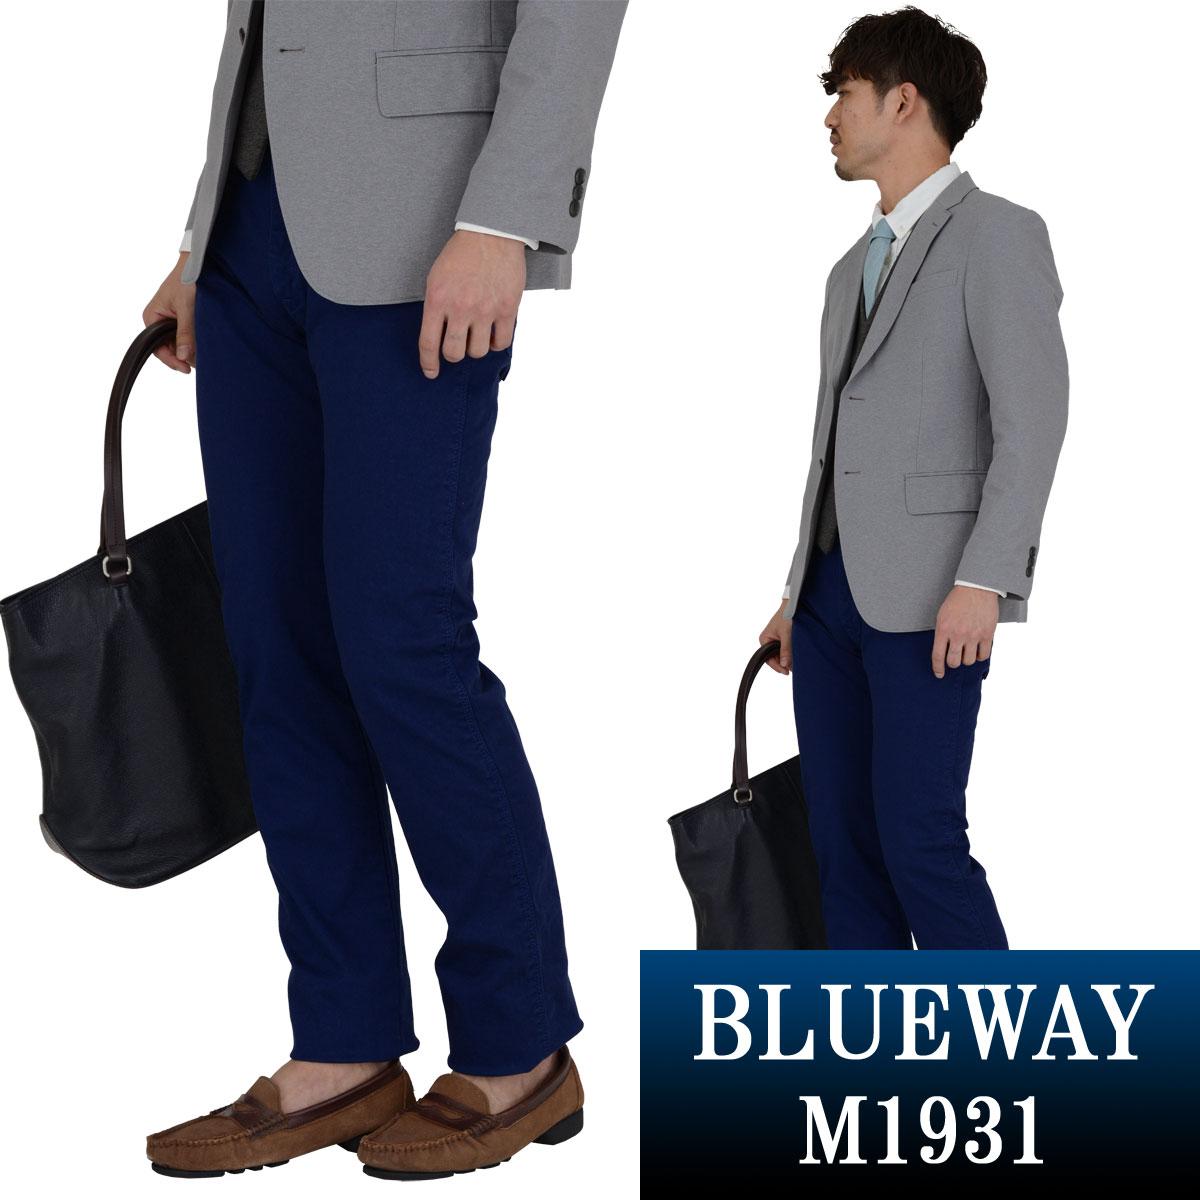 BLUEWAY:コーマストレッチサテン・タイトストレート パンツ(ネイビー):M1931-35 ブルーウェイ メンズ 裾上げ